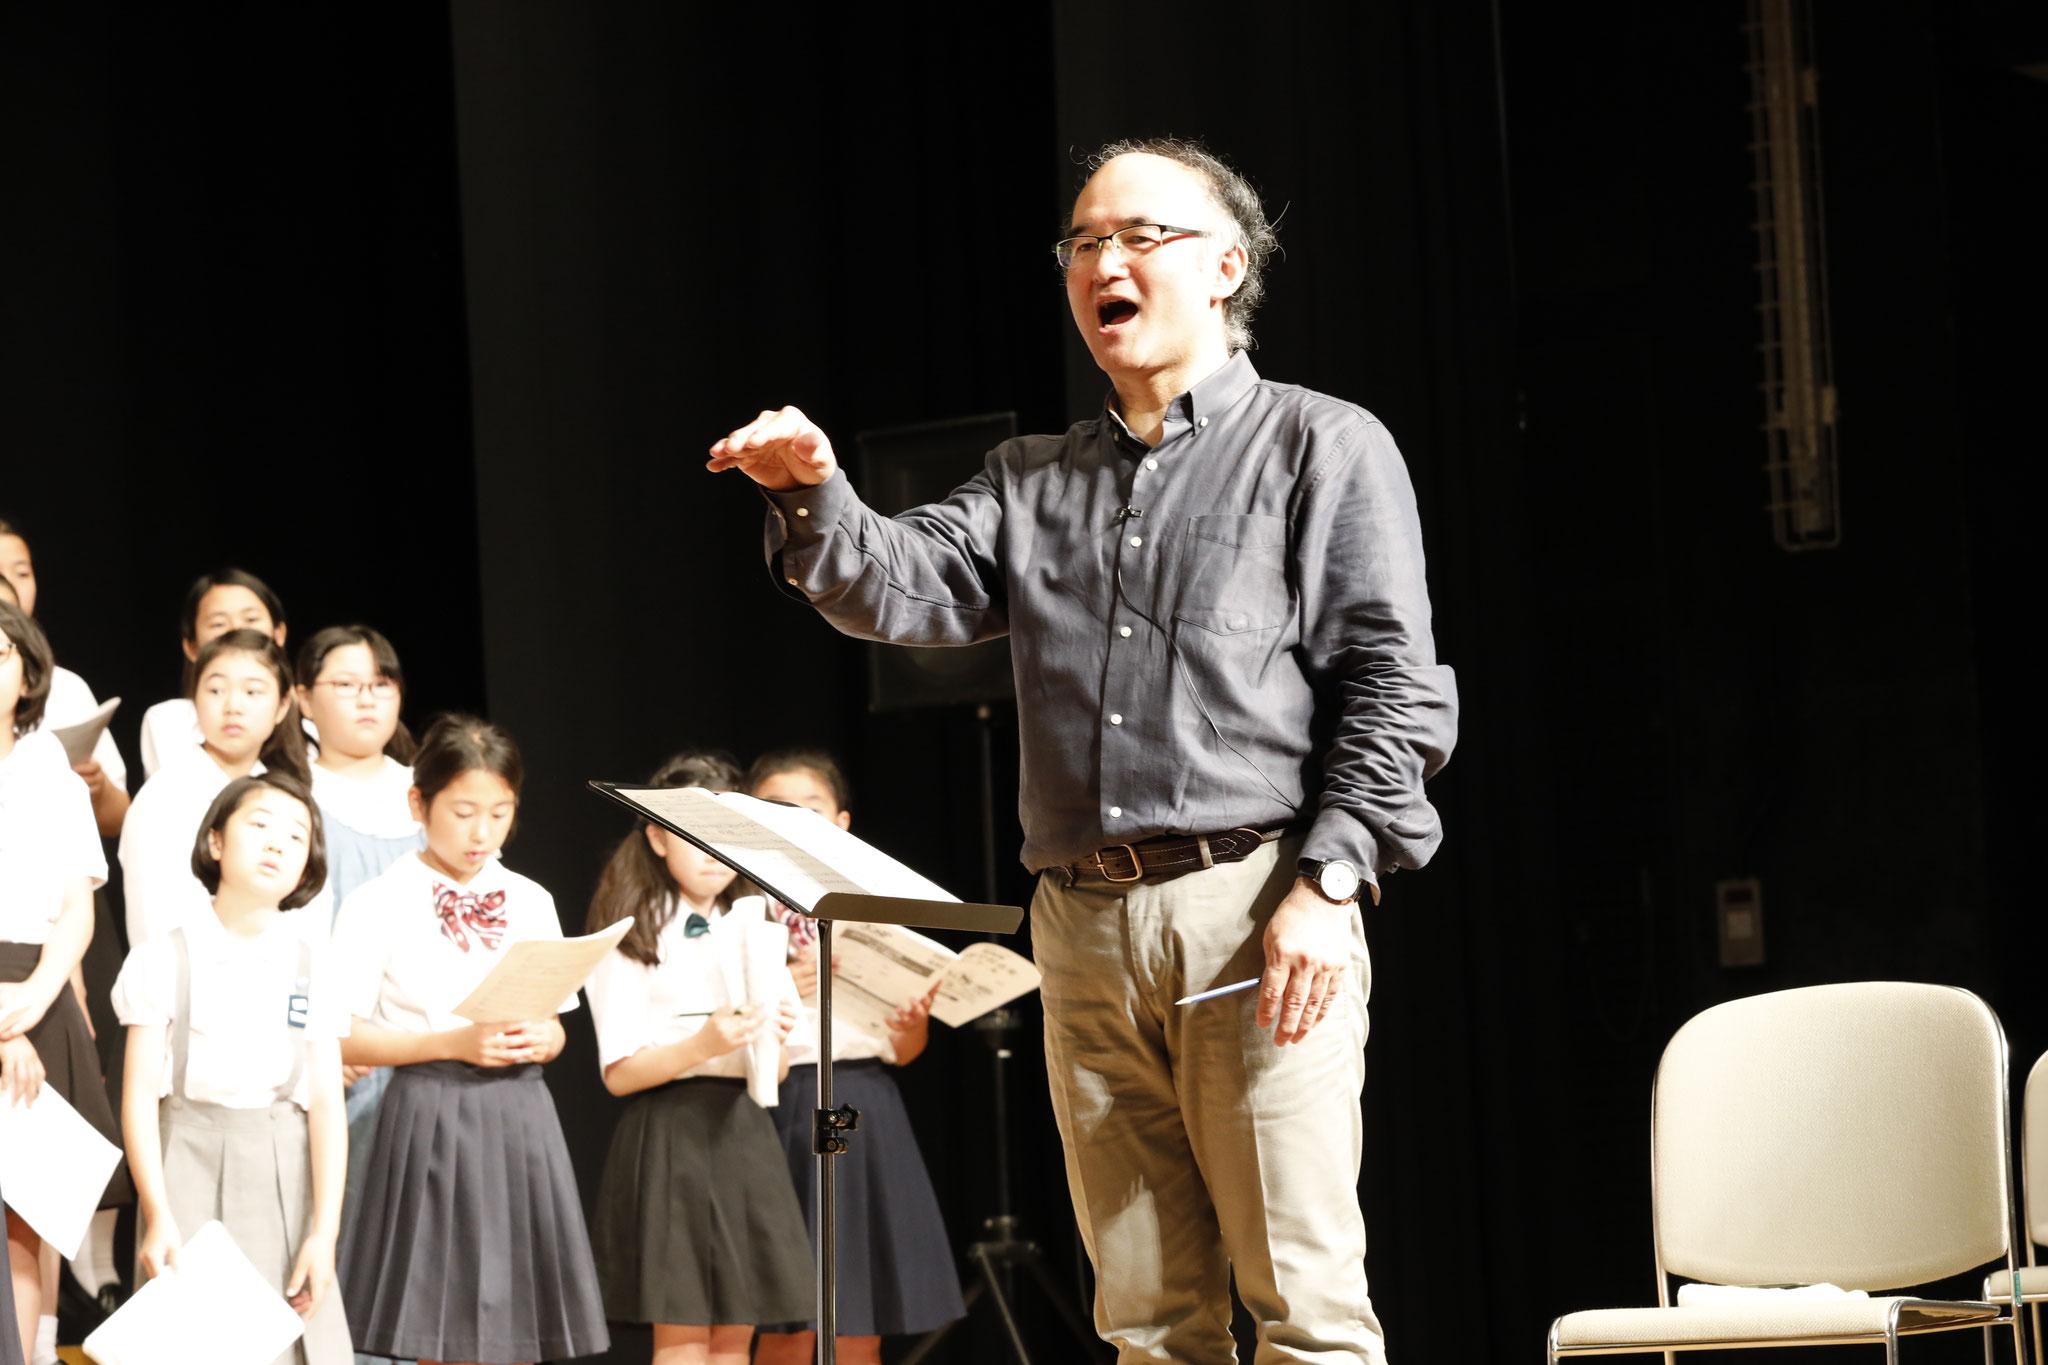 NHK全国学校音楽コンクール課題曲講習会(小学校) 講師:清水雅彦・大熊崇子